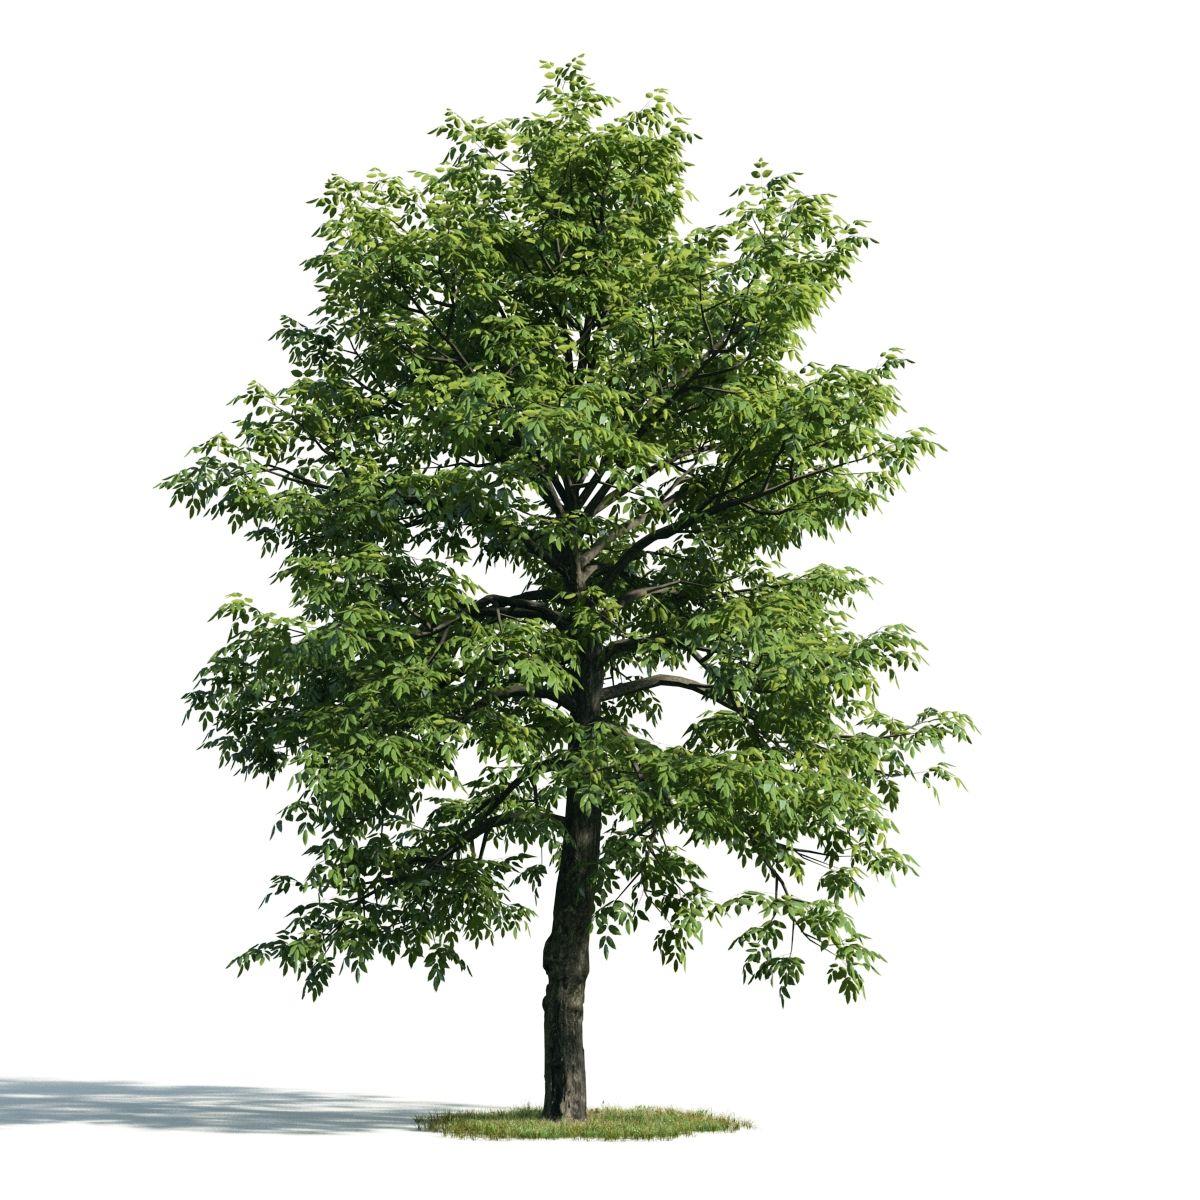 SKETCHUP] 3D TREE – VRAY READY | Bedroom design | 3d tree